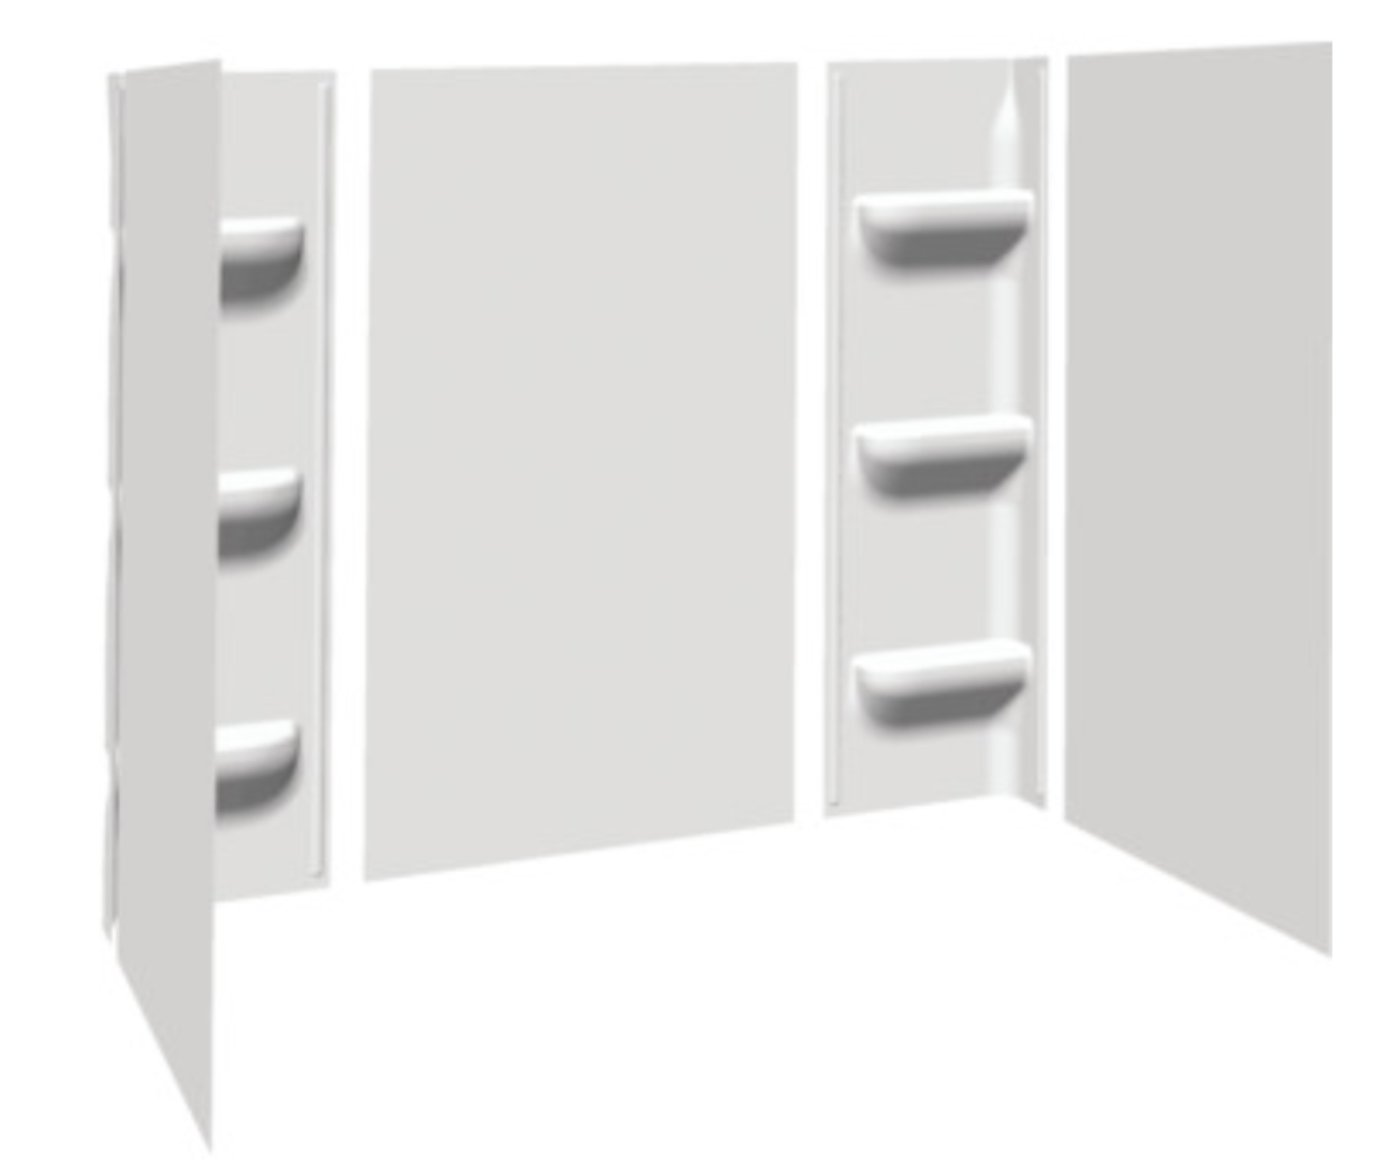 Bath Tub Shower Wall Surround 5 Piece White - - Amazon.com